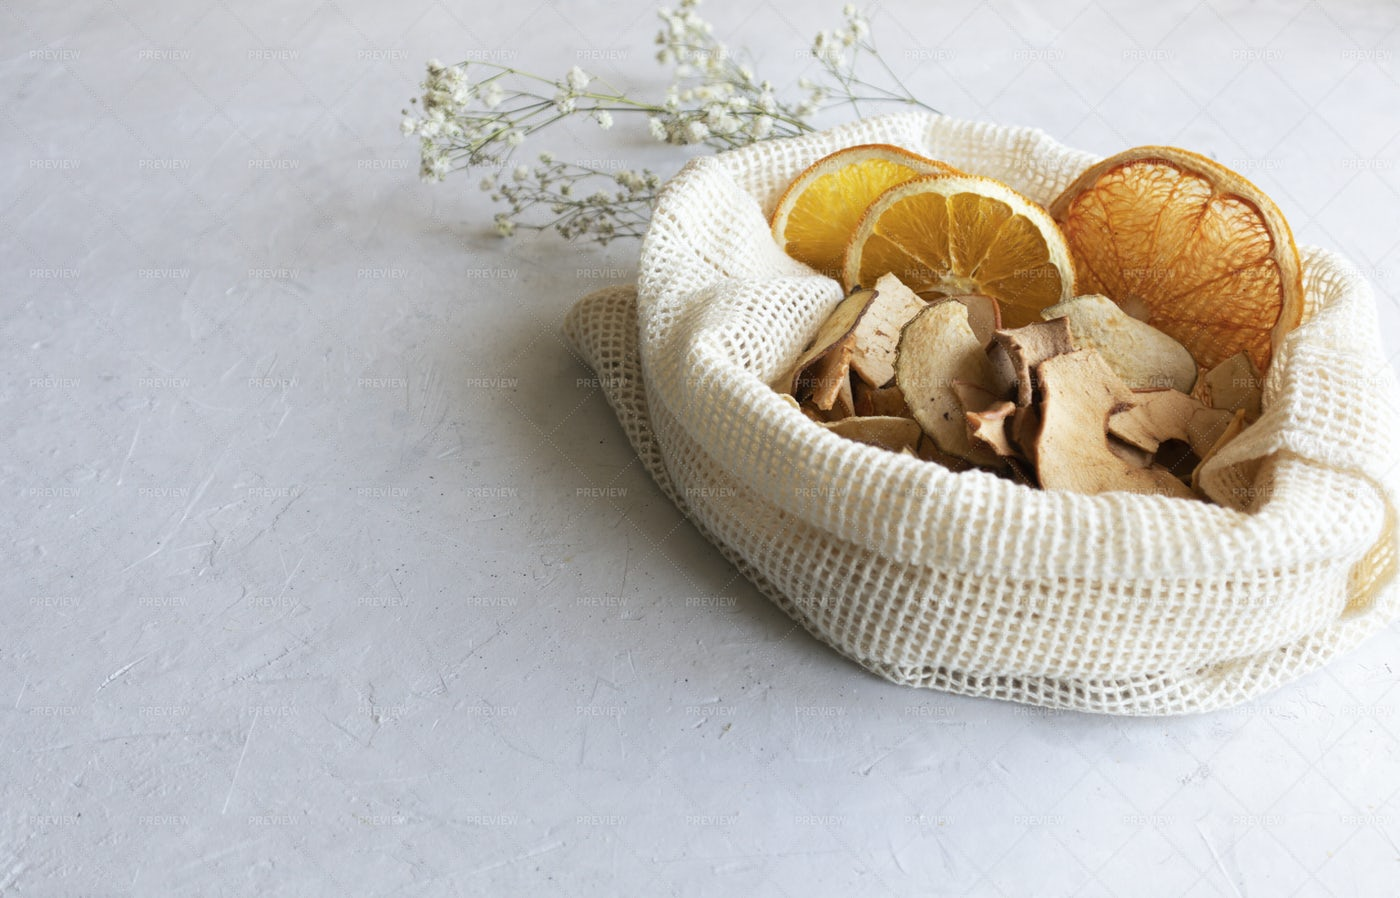 Homemade Dried Fruits: Stock Photos